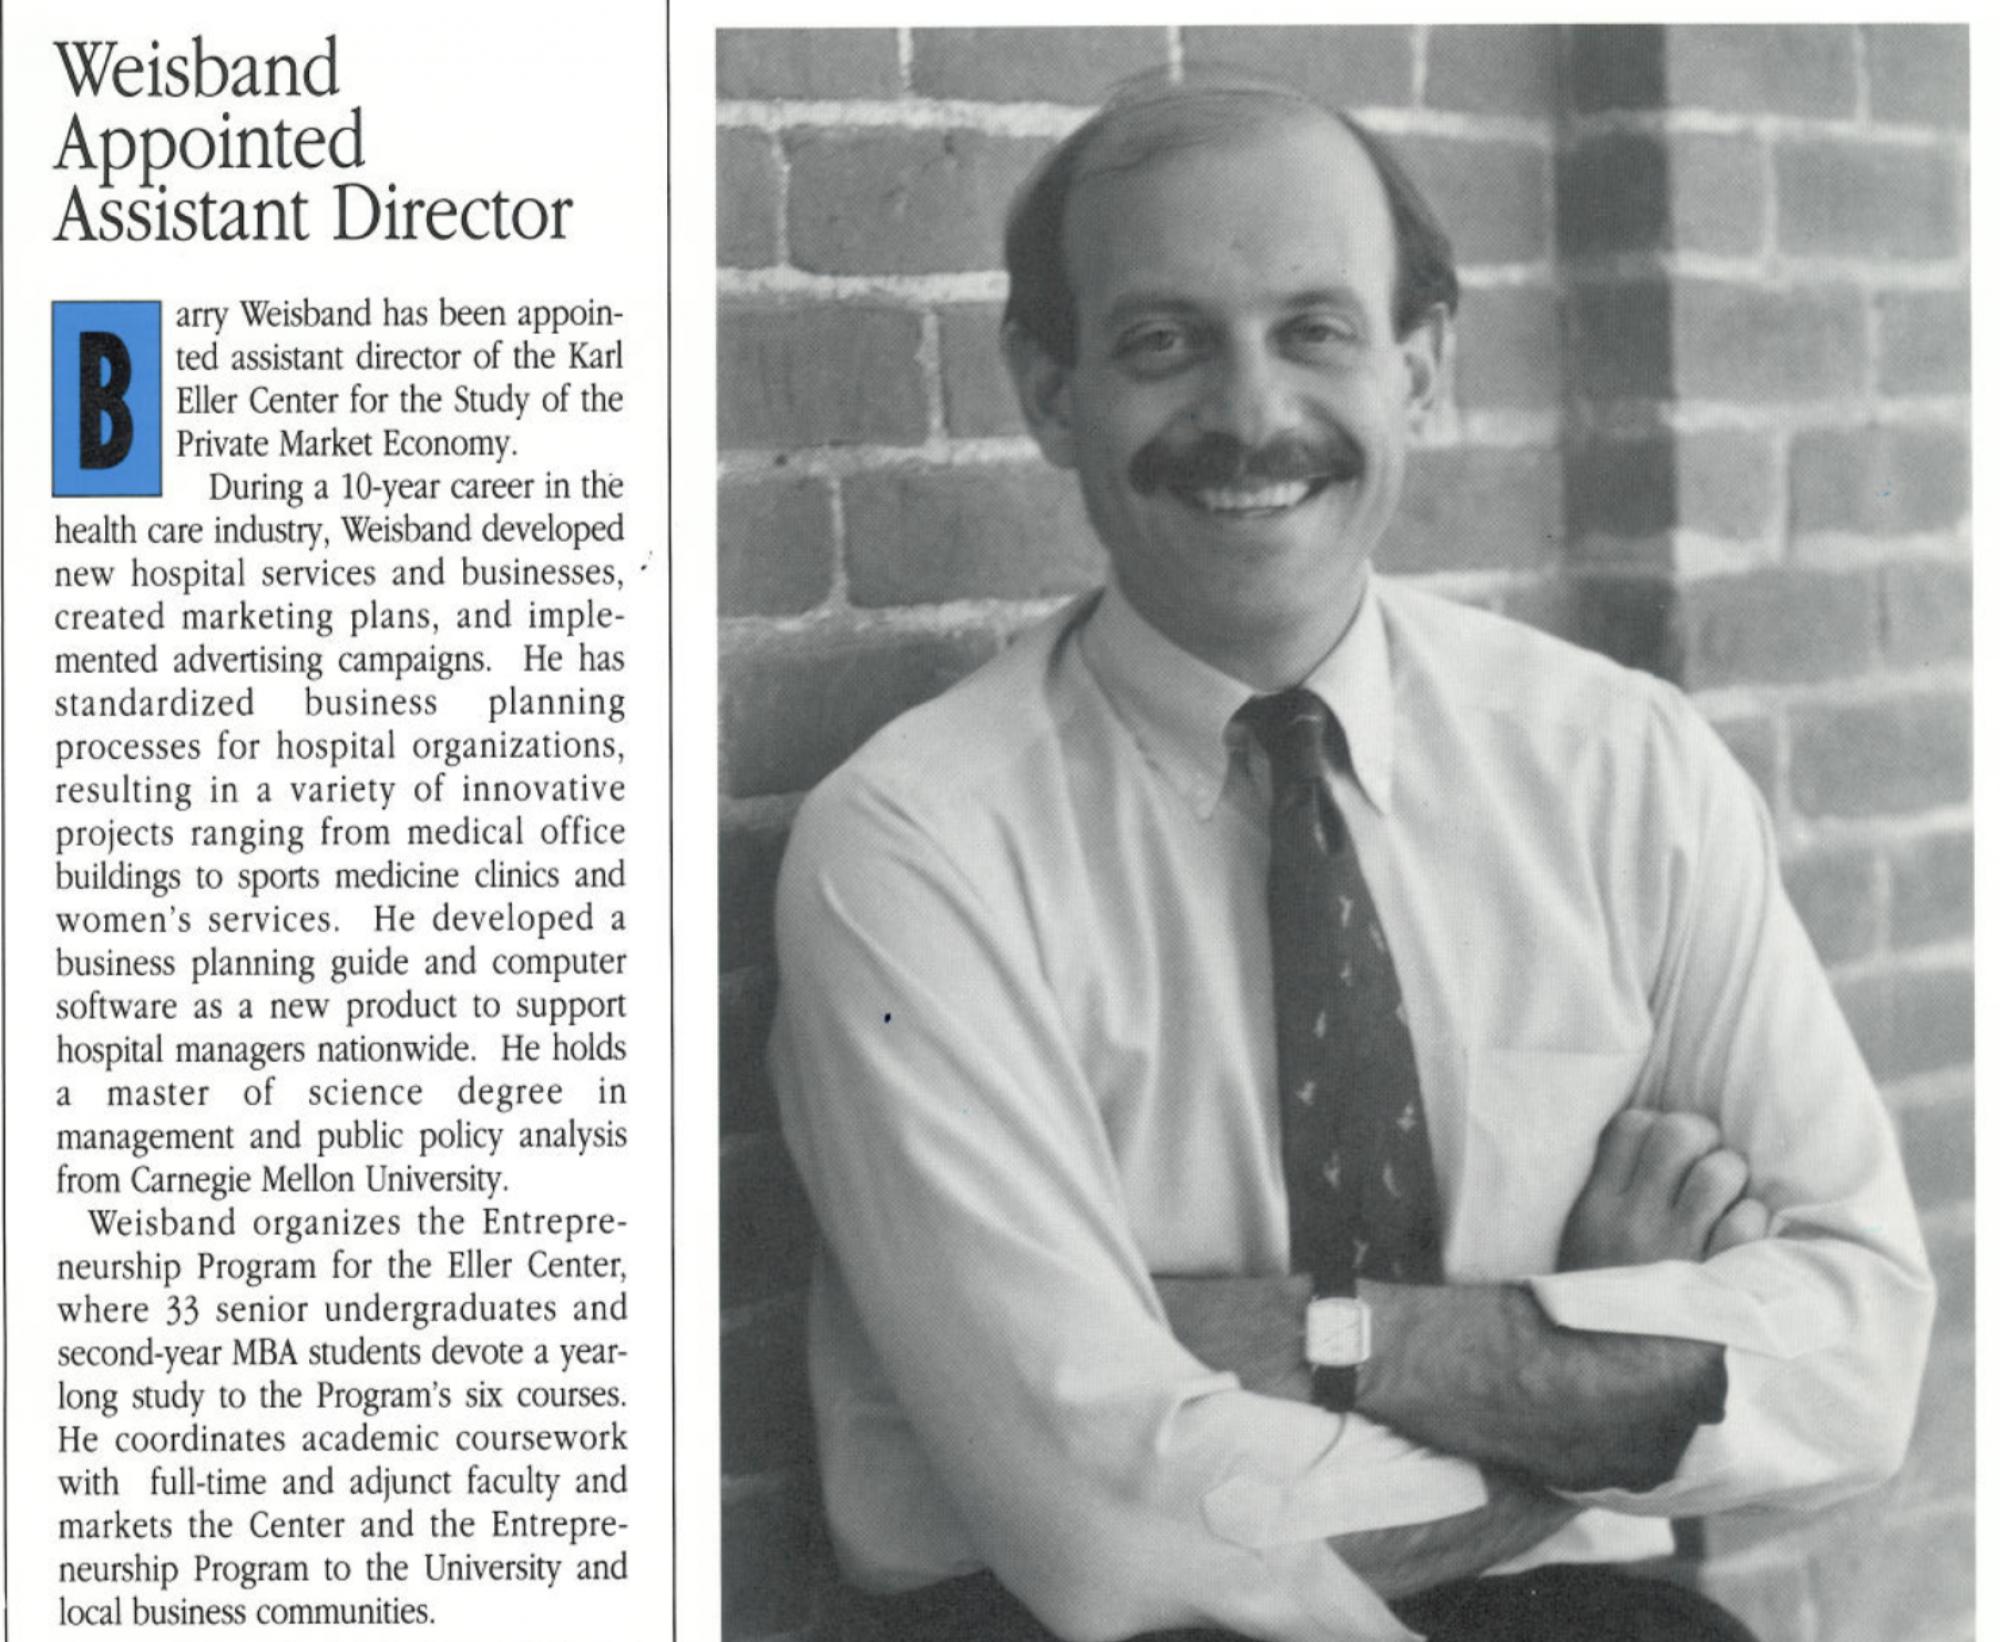 1991- Winter/Spring issue of Enterprise, the publication of the Karl Eller Center